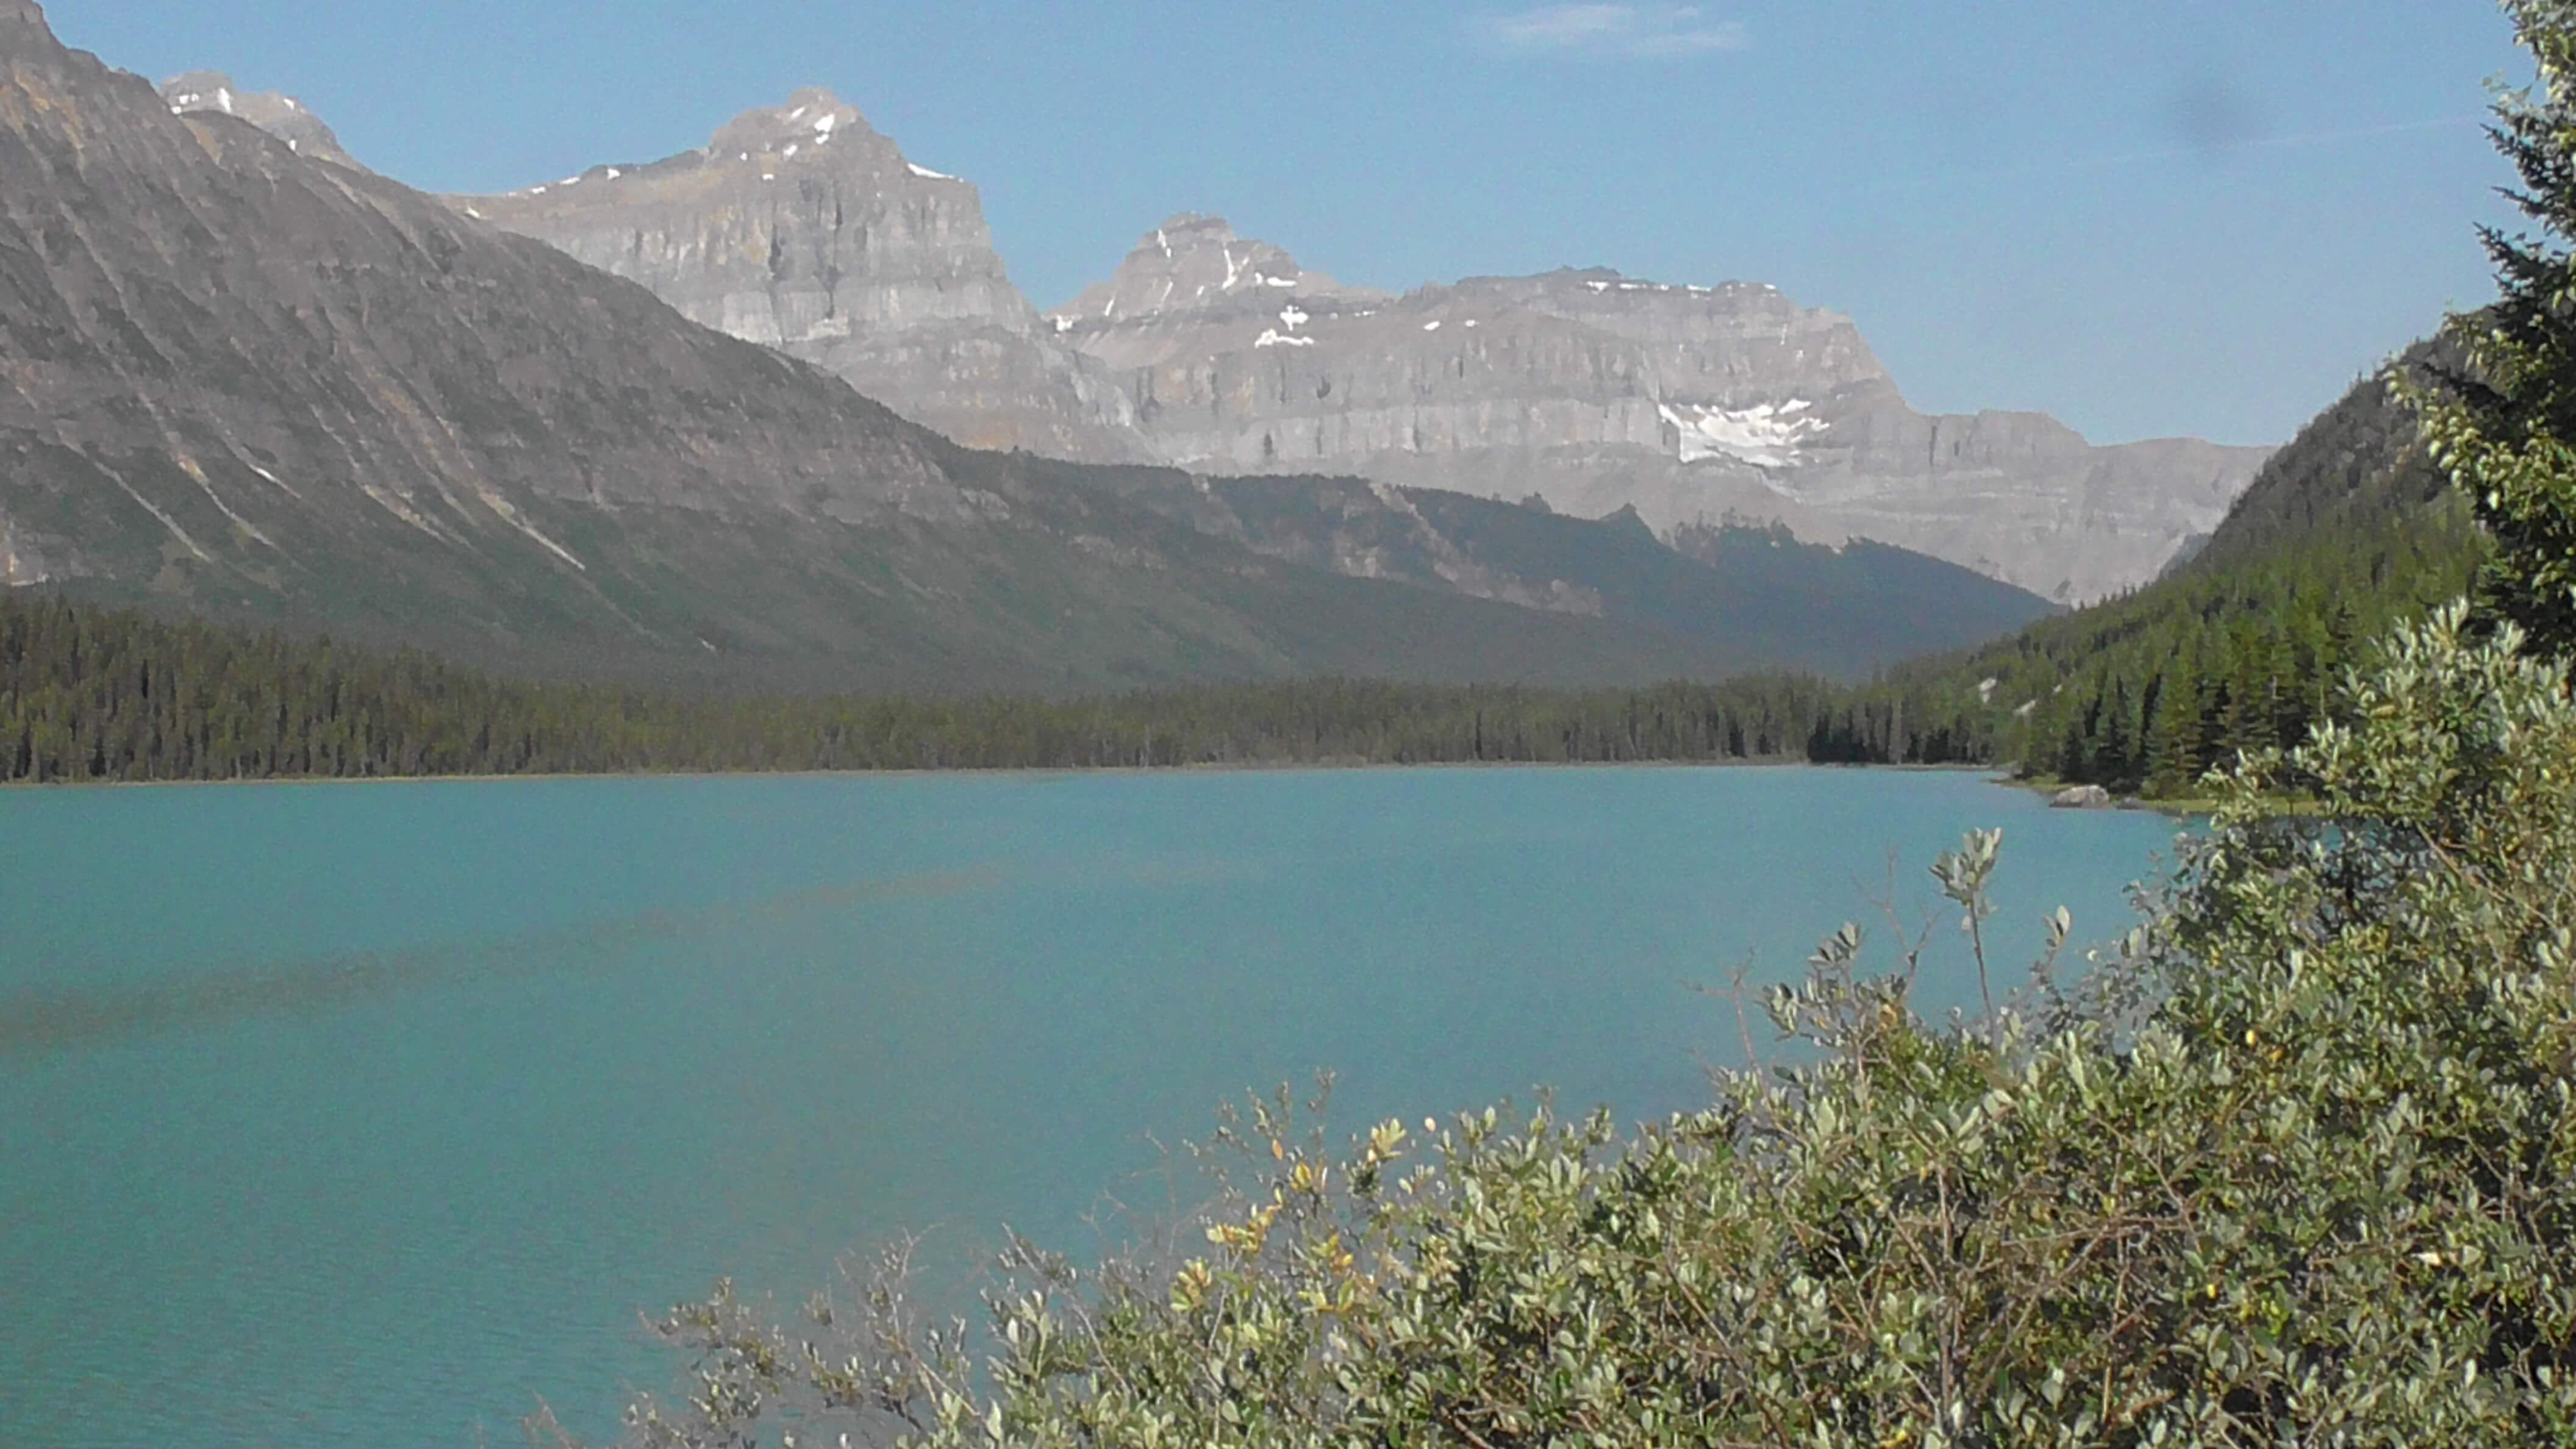 Lake Waterfowl, Banff National Park, Alberta